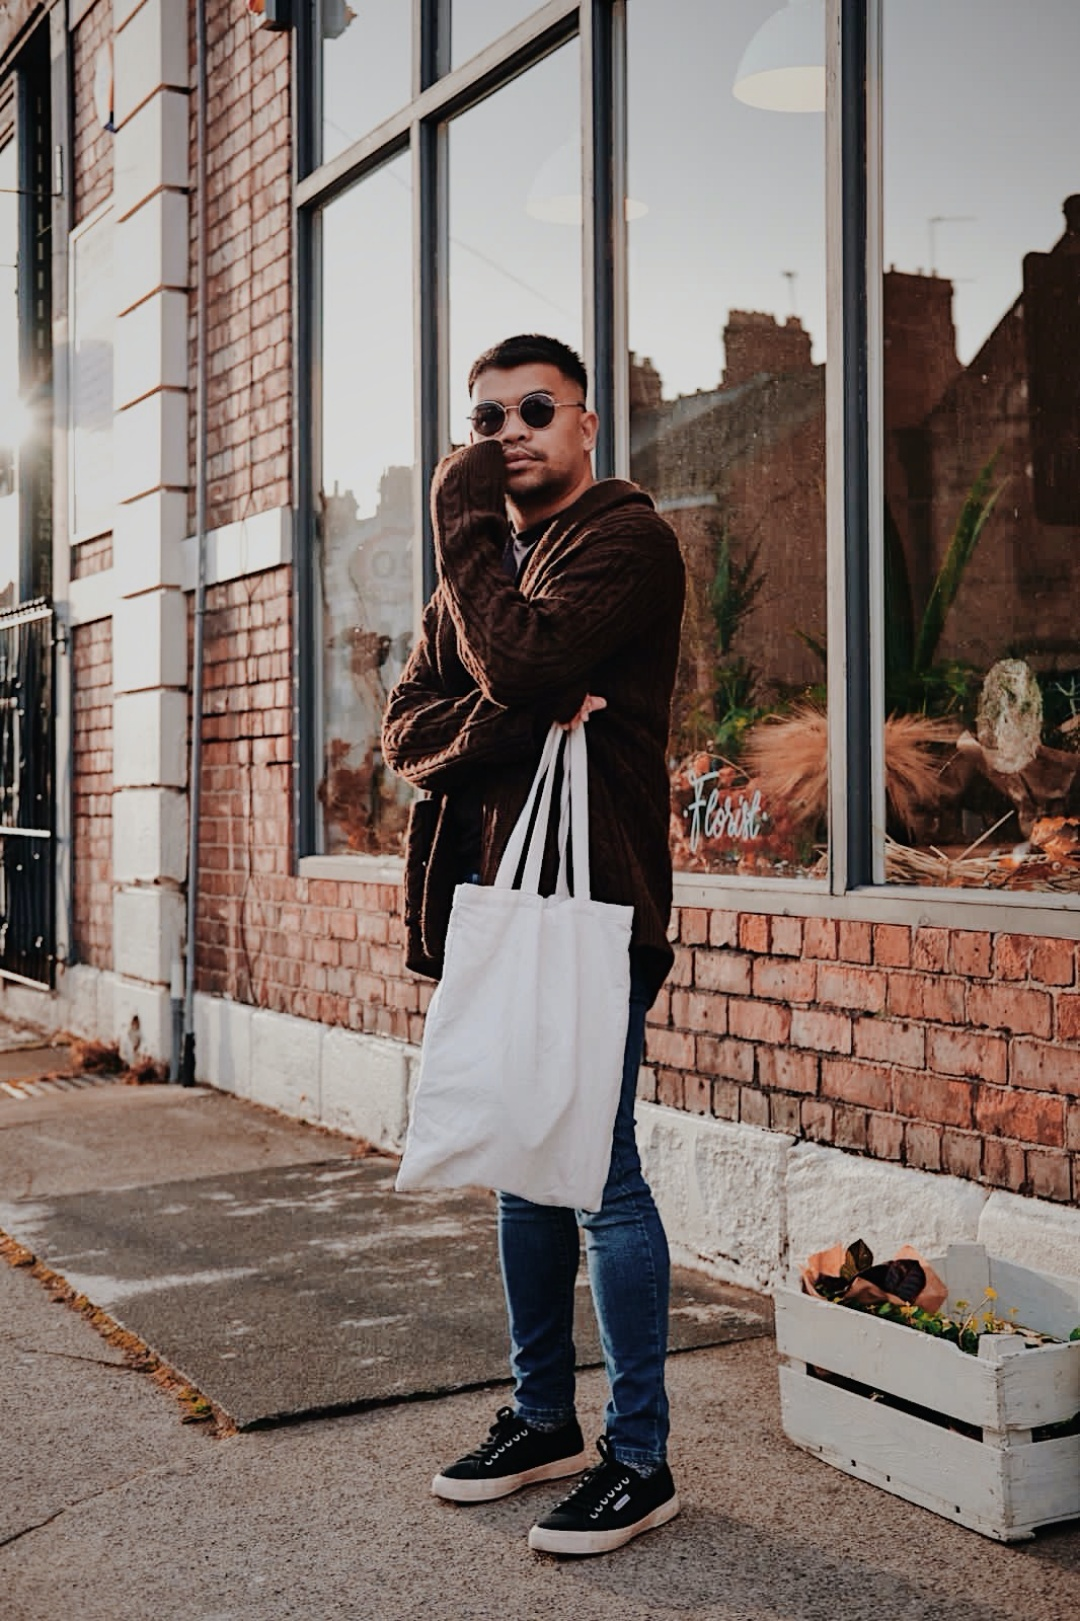 forkintherose-bloggers-newcastle-best-fashion-almostablogger-cafe.jpg